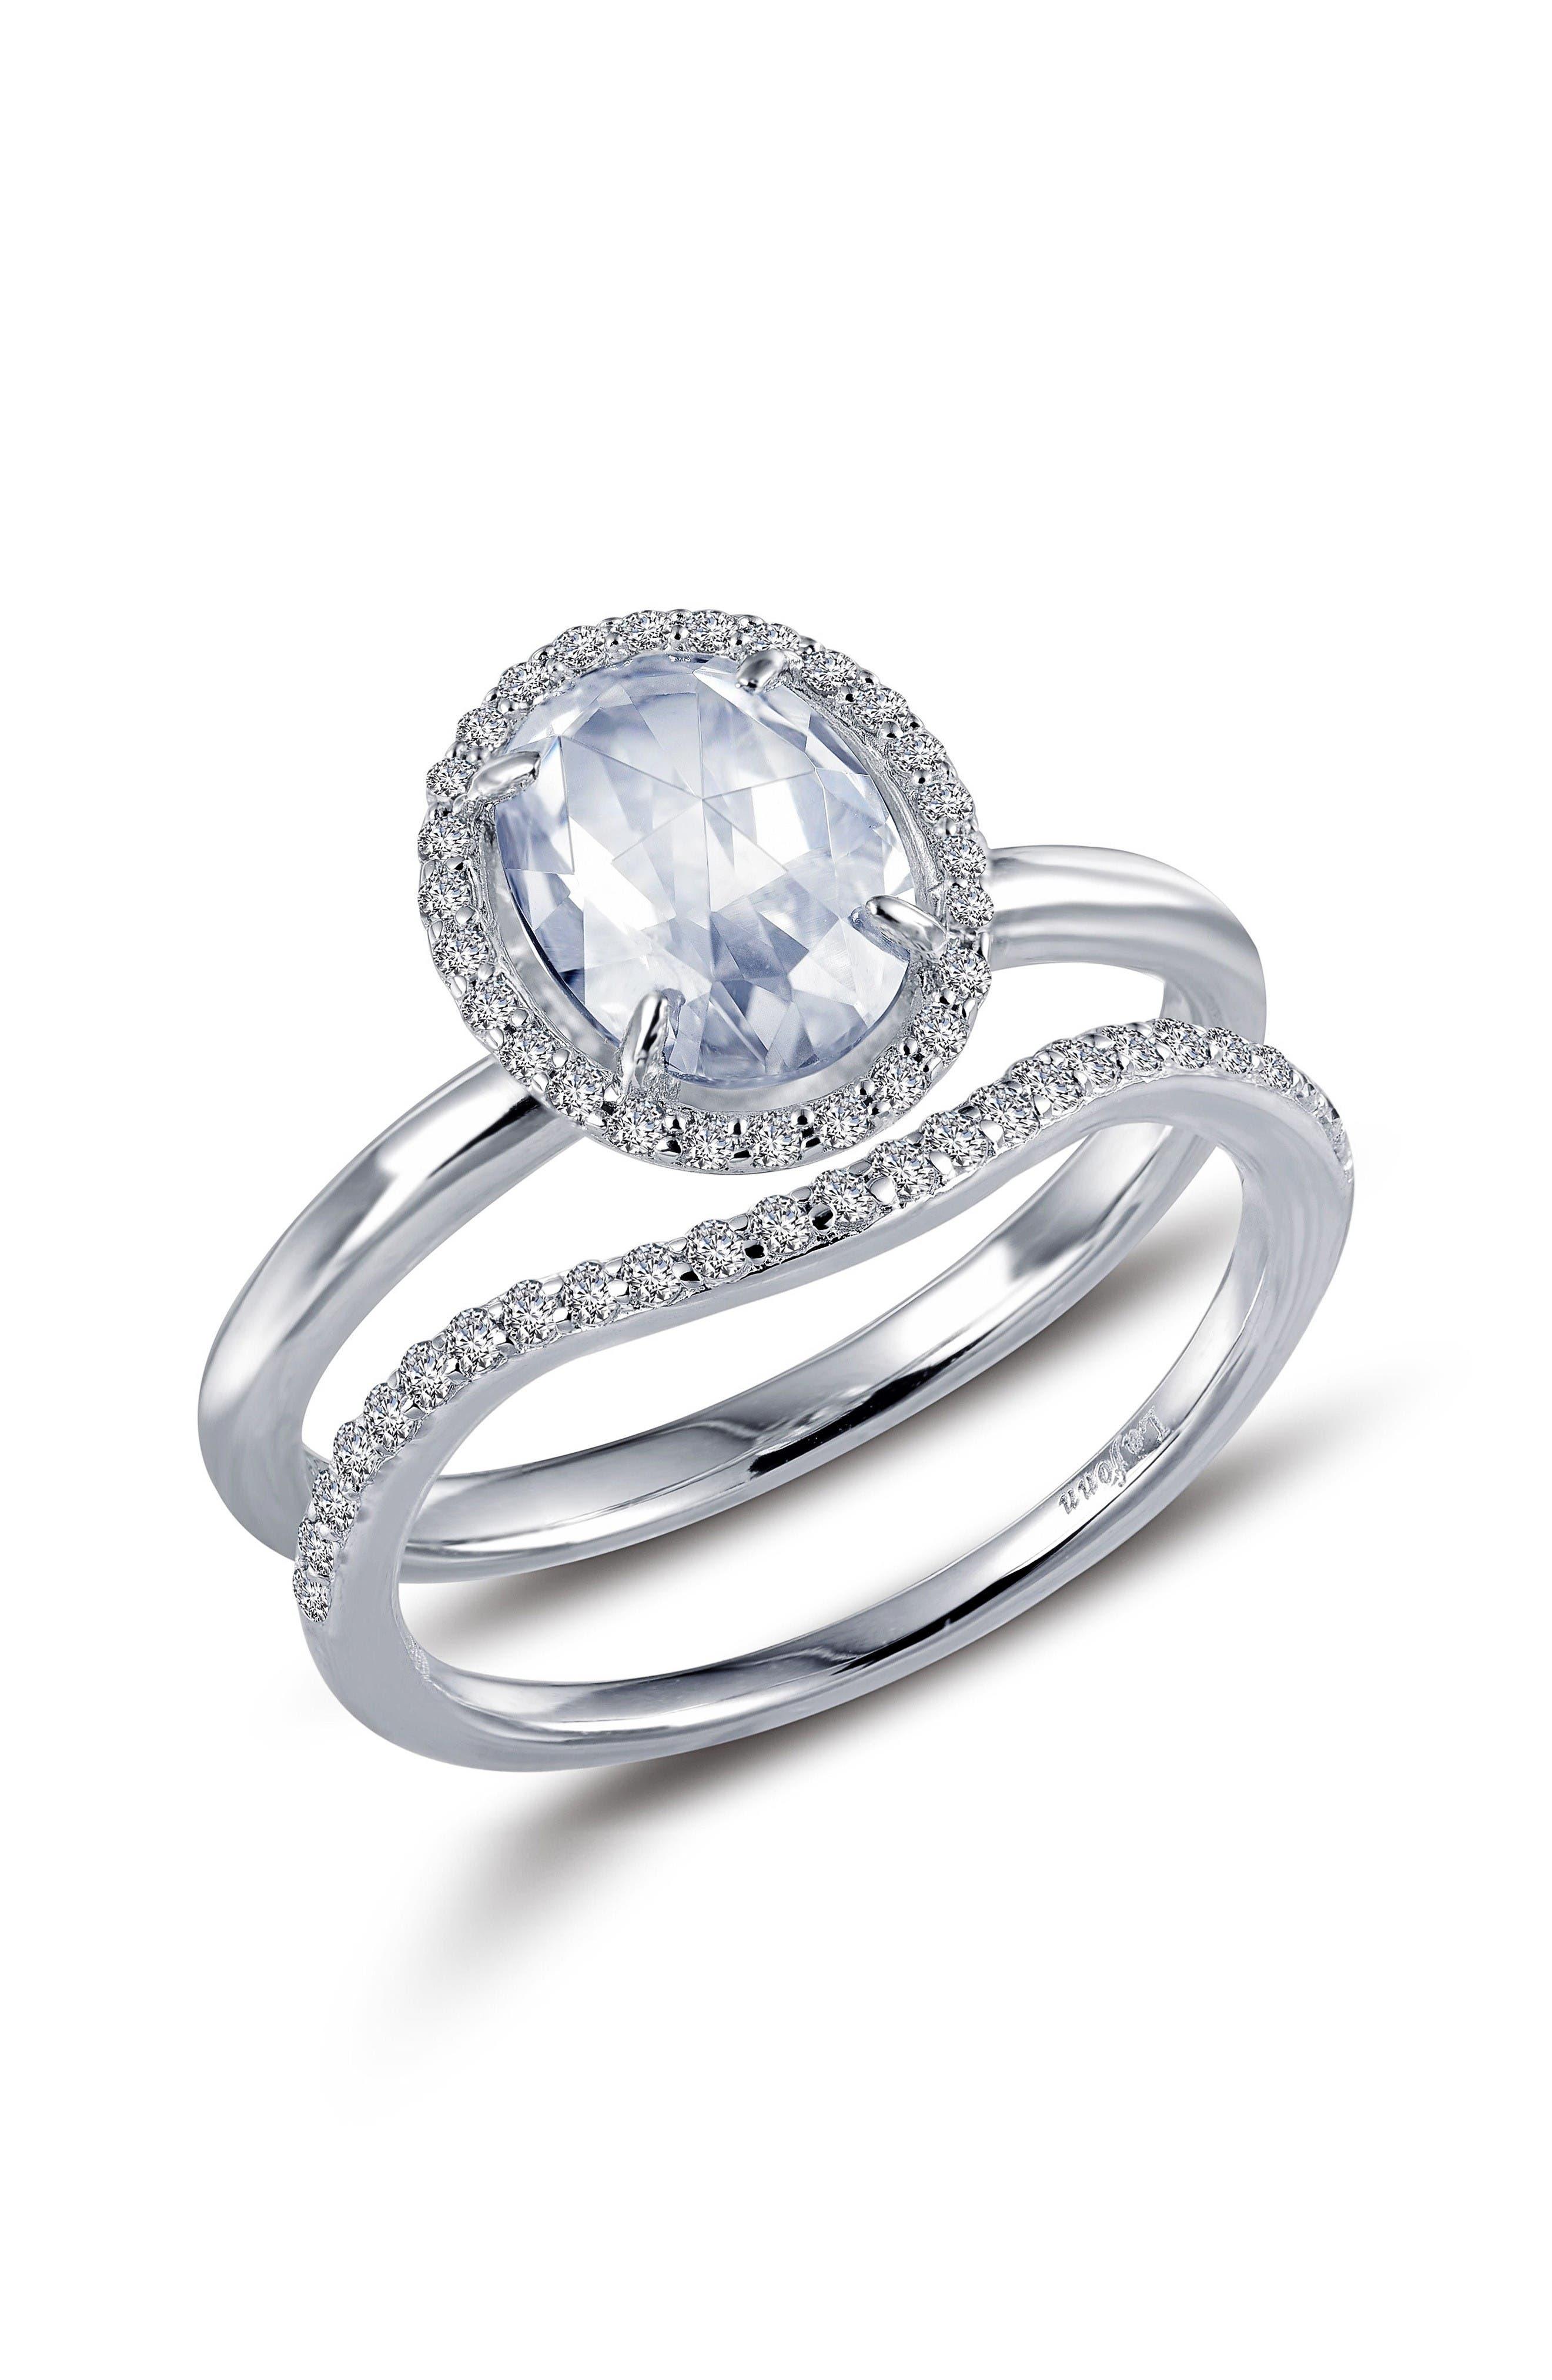 Alternate Image 1 Selected - Lafonn Rose Cut Simulated Diamond Ring